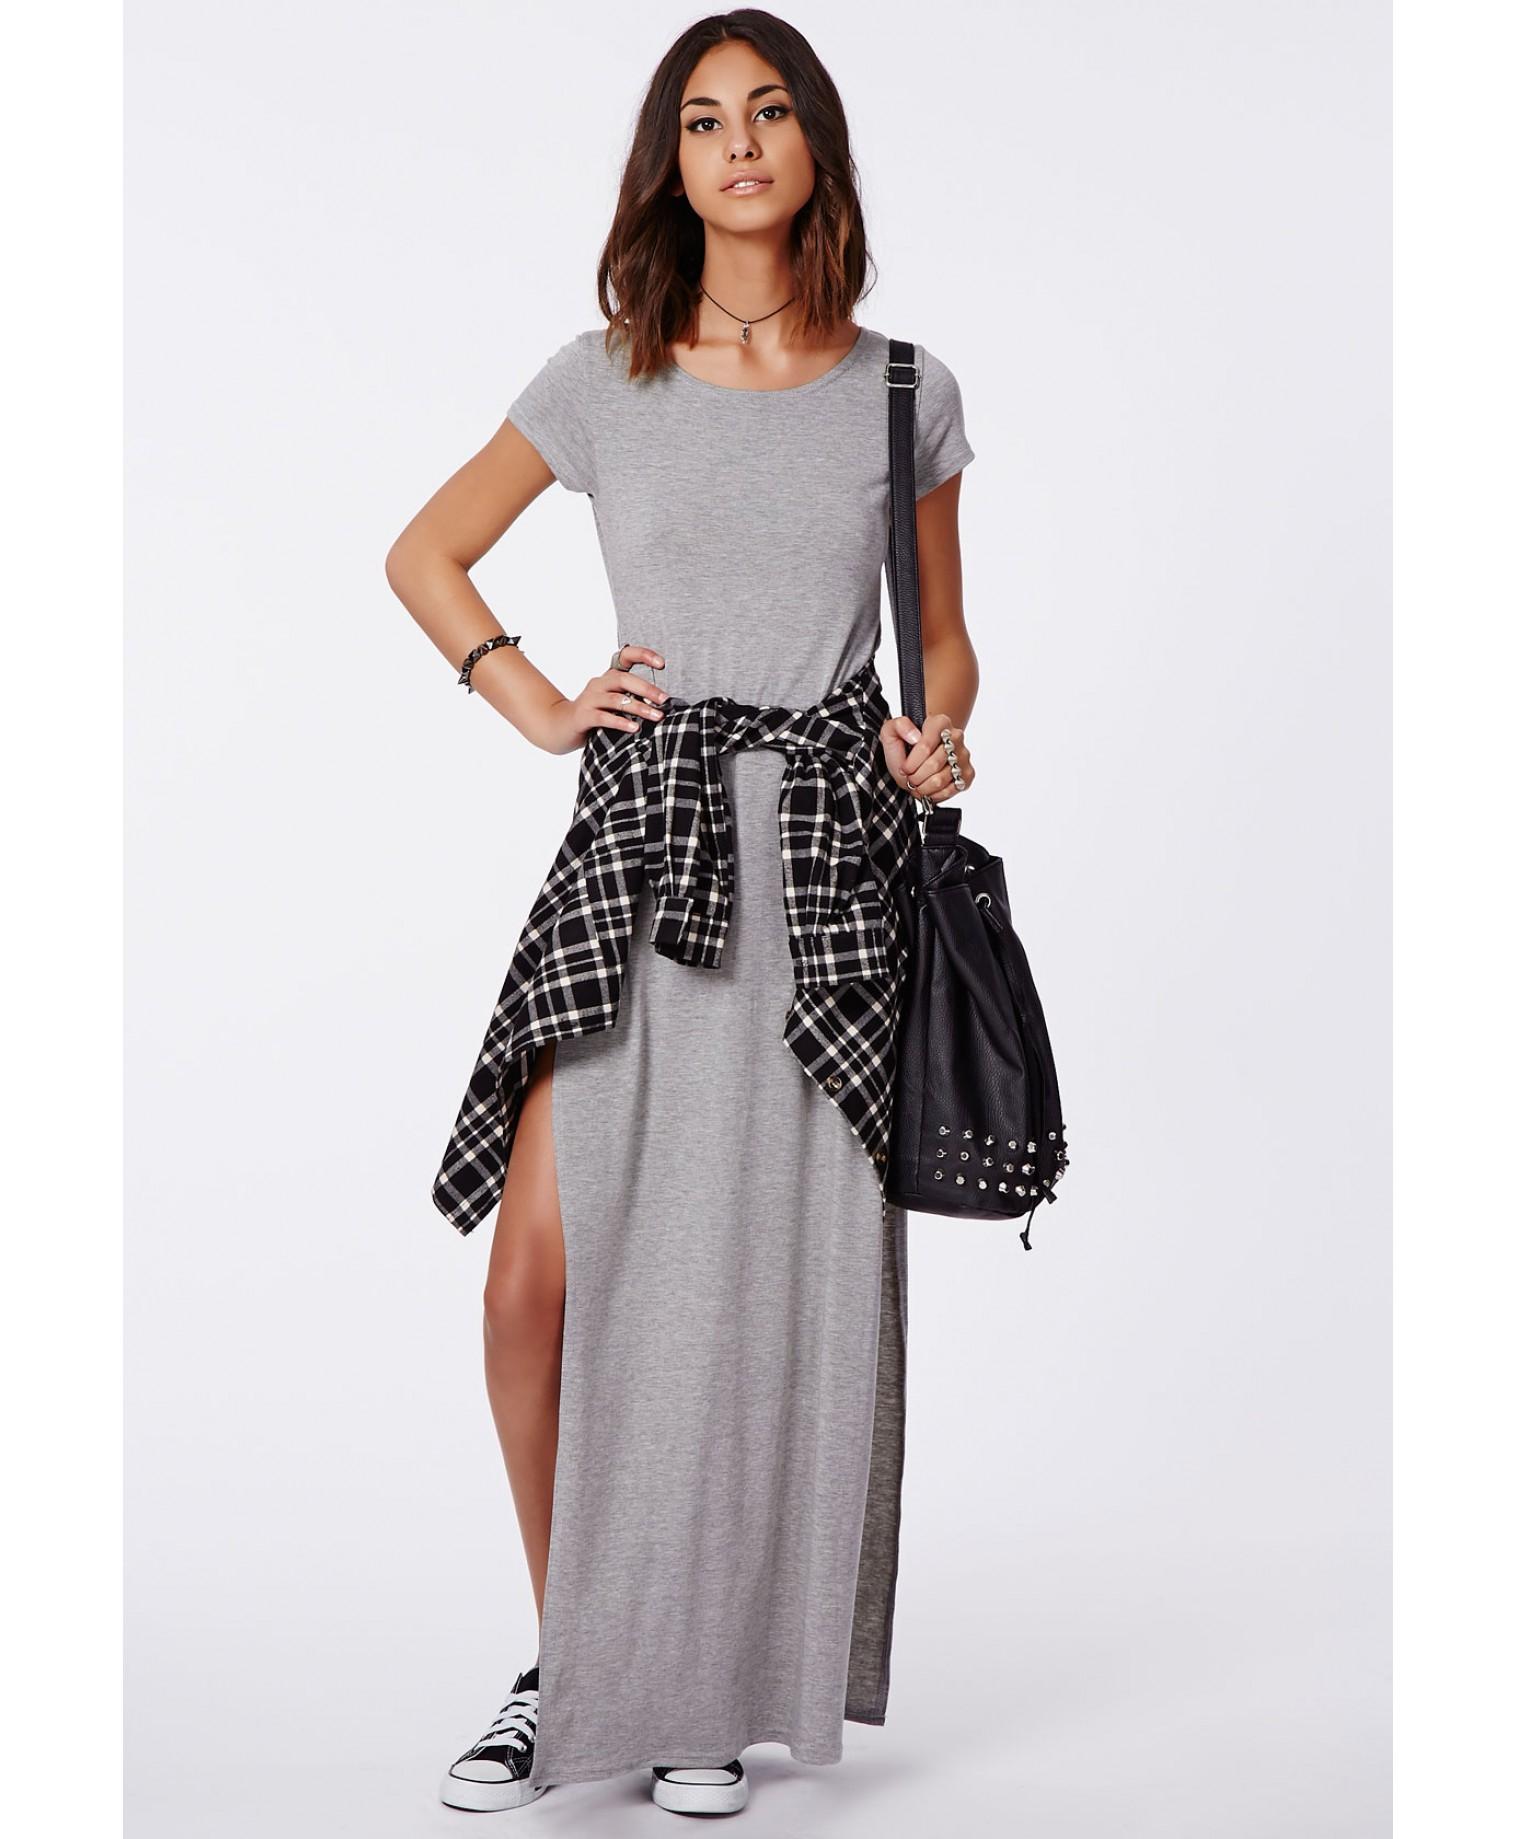 K michelle lace dress dillards